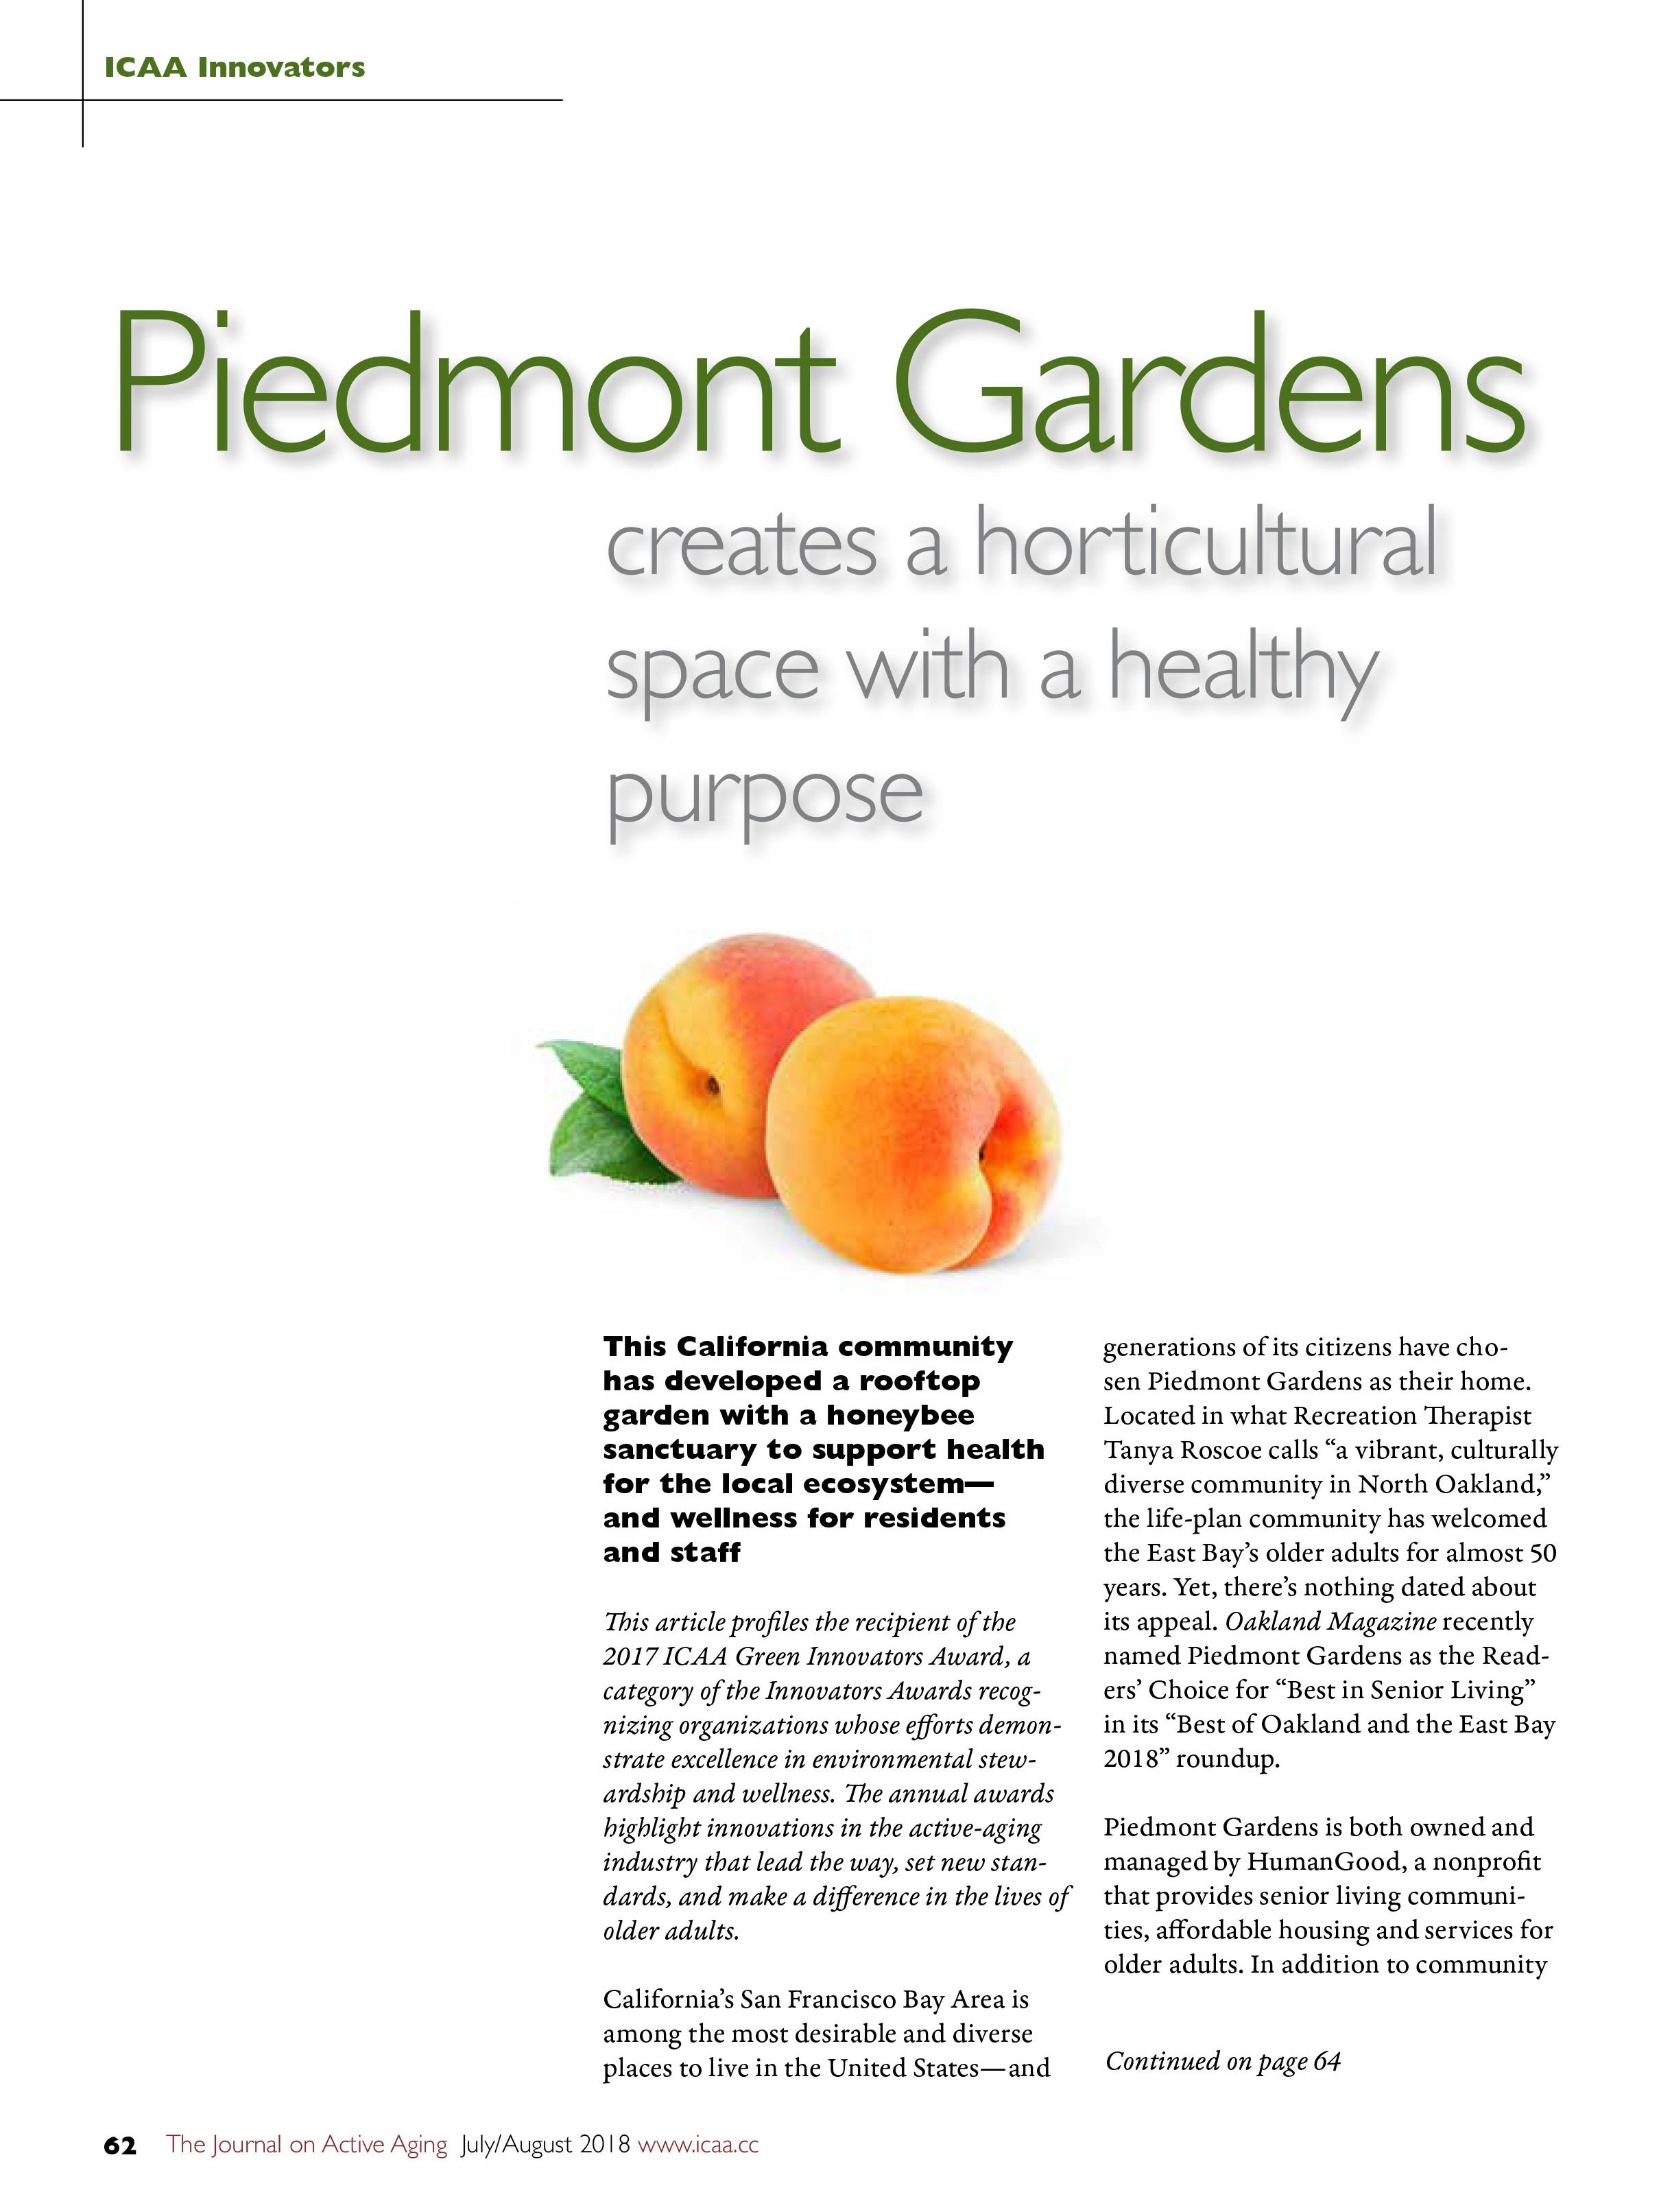 Innovators-Piedmont Gardens-low res-1.jpg